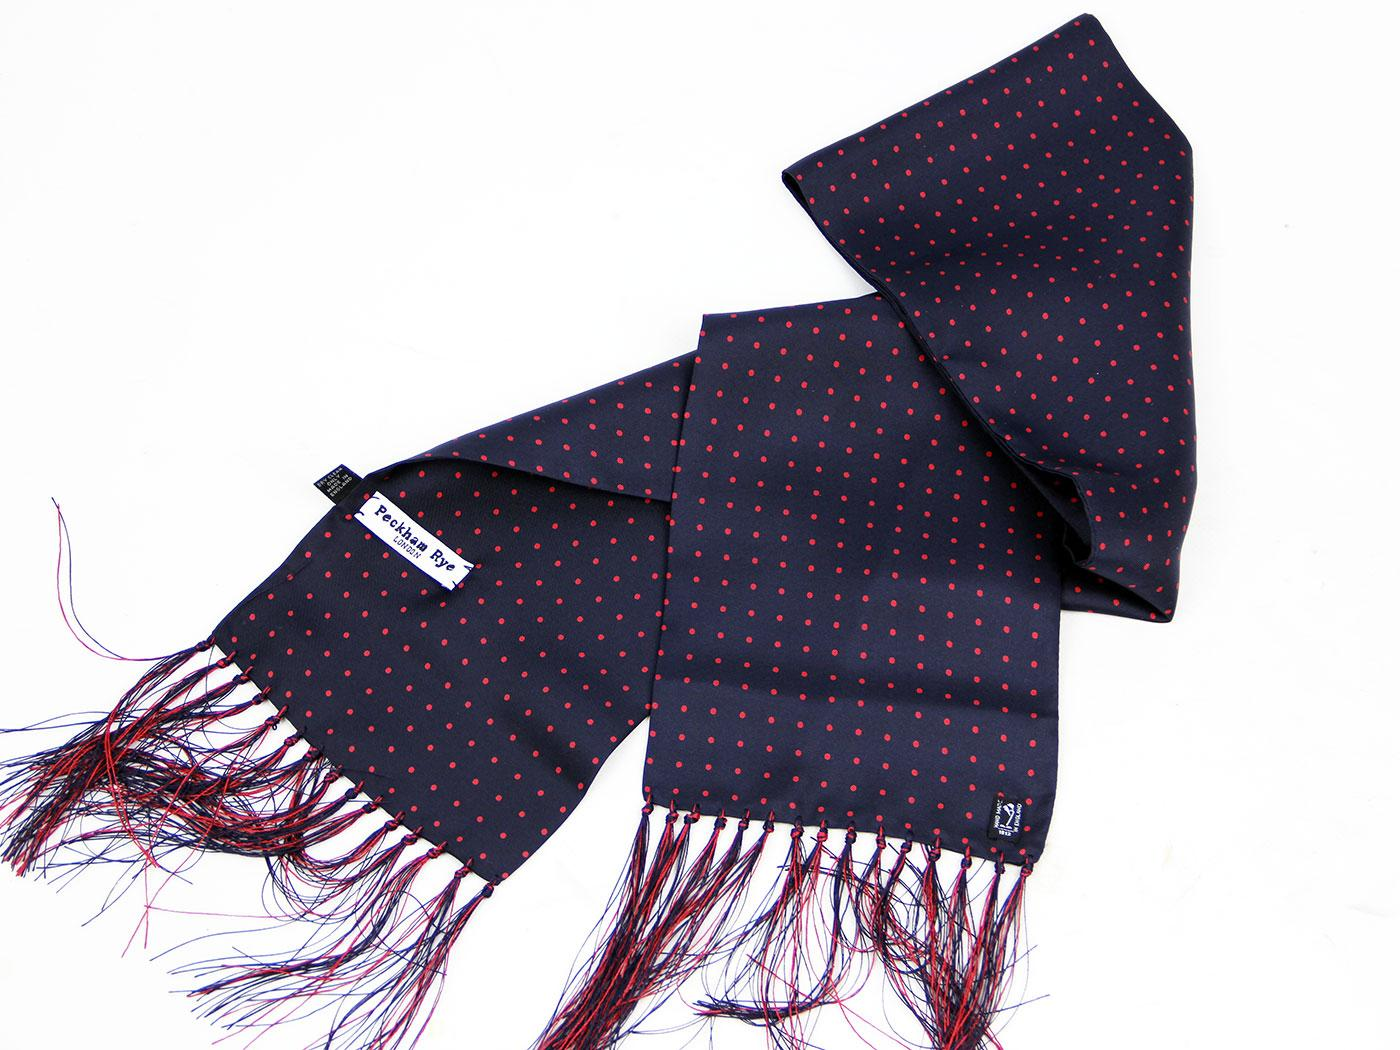 peckham rye spot retro 60s mod navy silk scarf